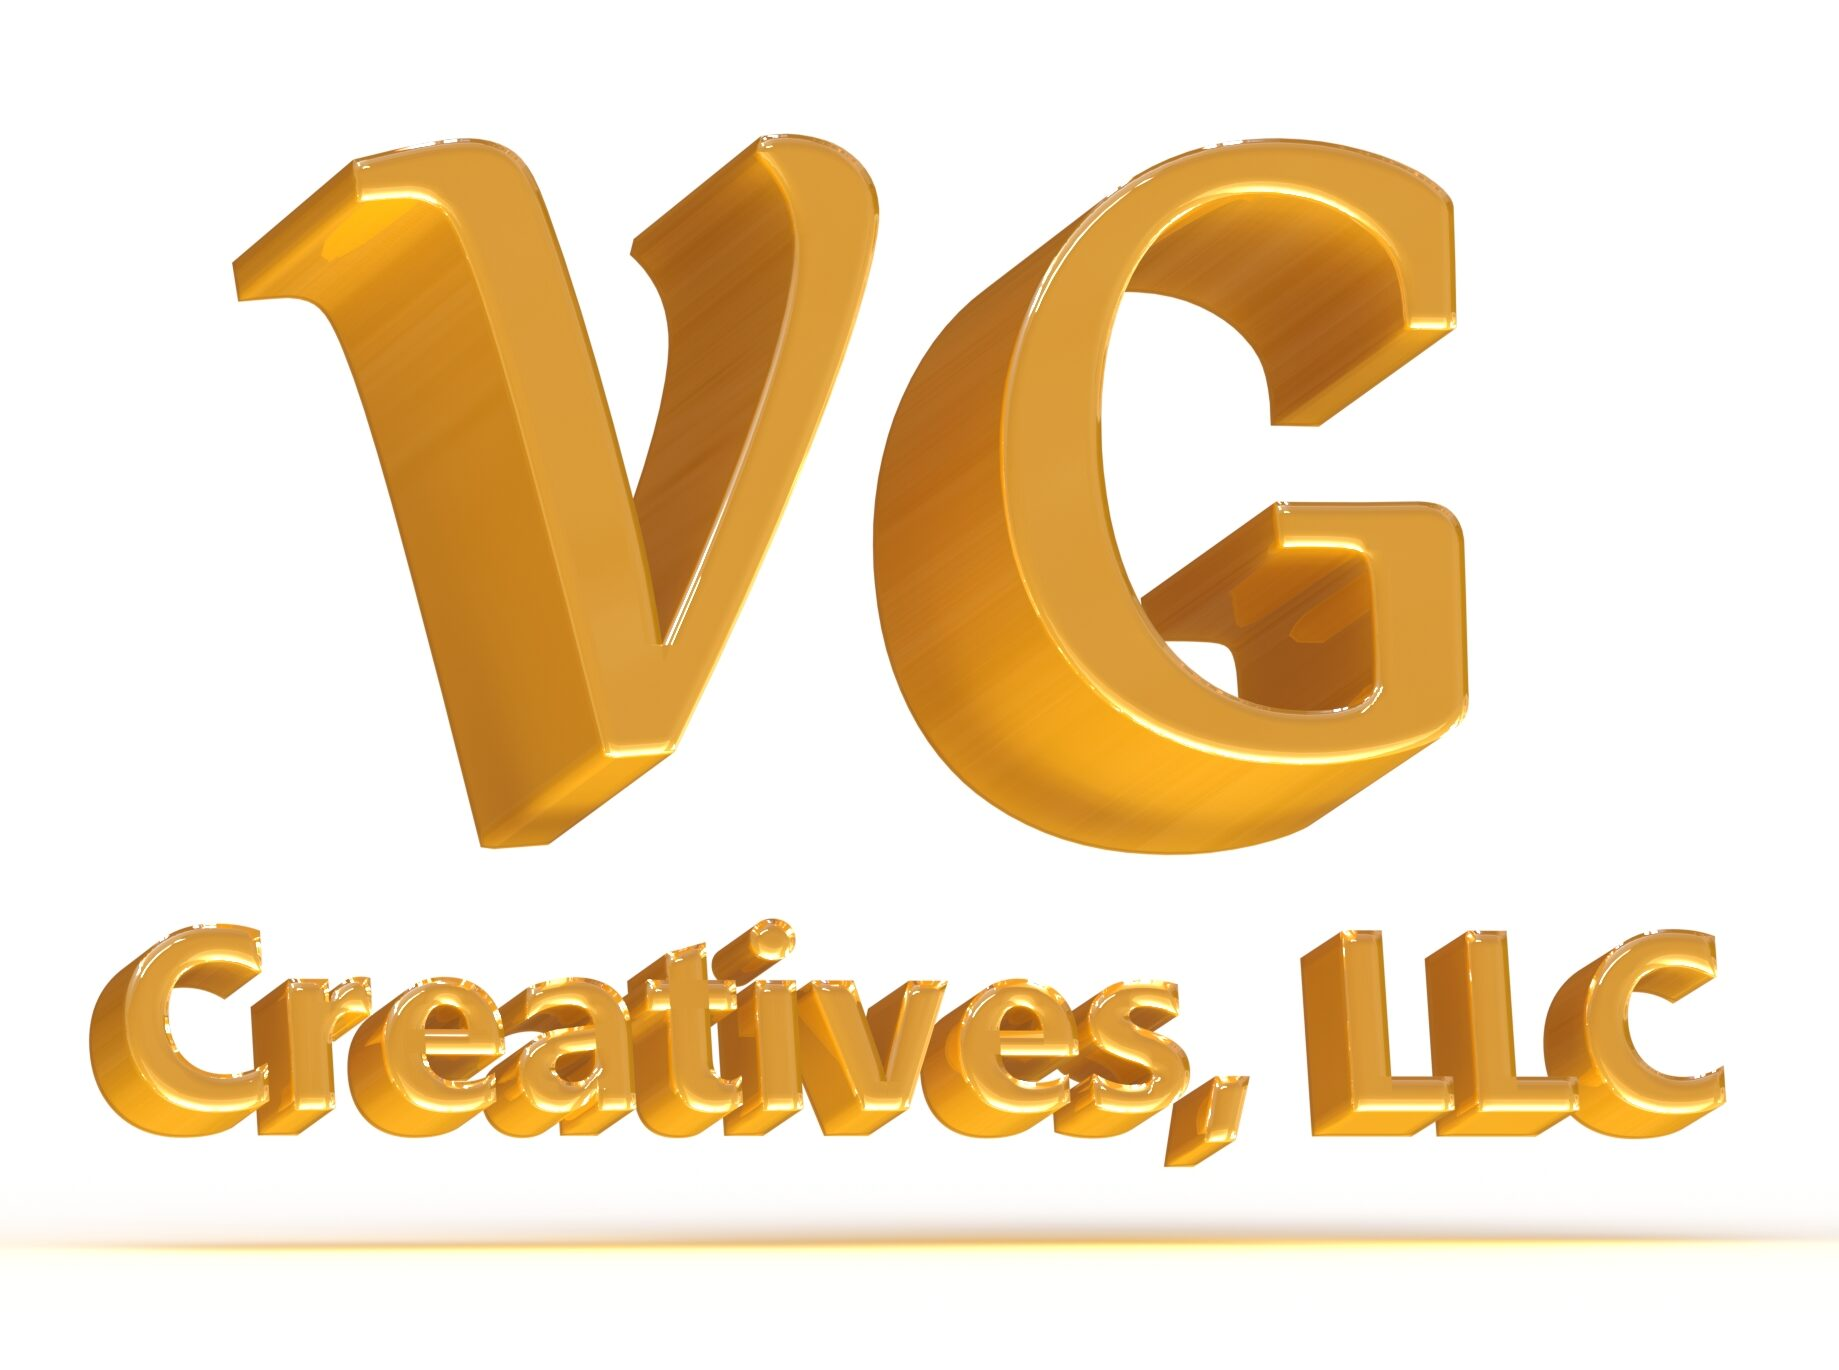 VG Creatives – Engineering division